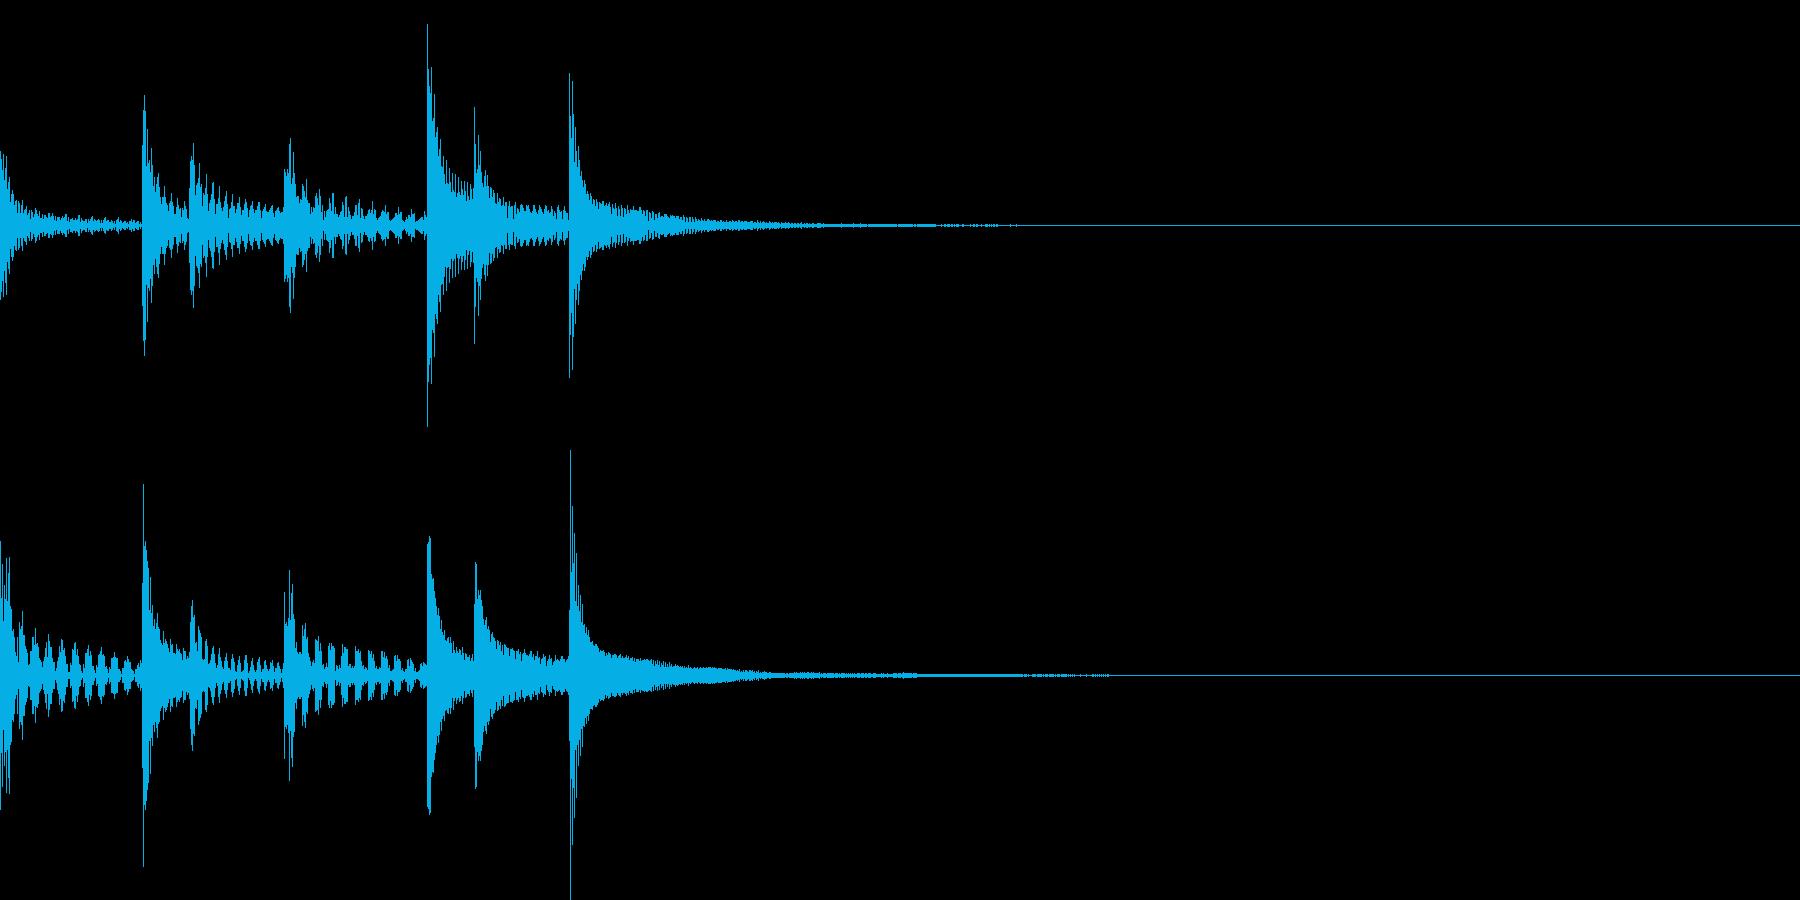 SF宇宙ぽいテクノな効果音/ピンチ/急ぐの再生済みの波形